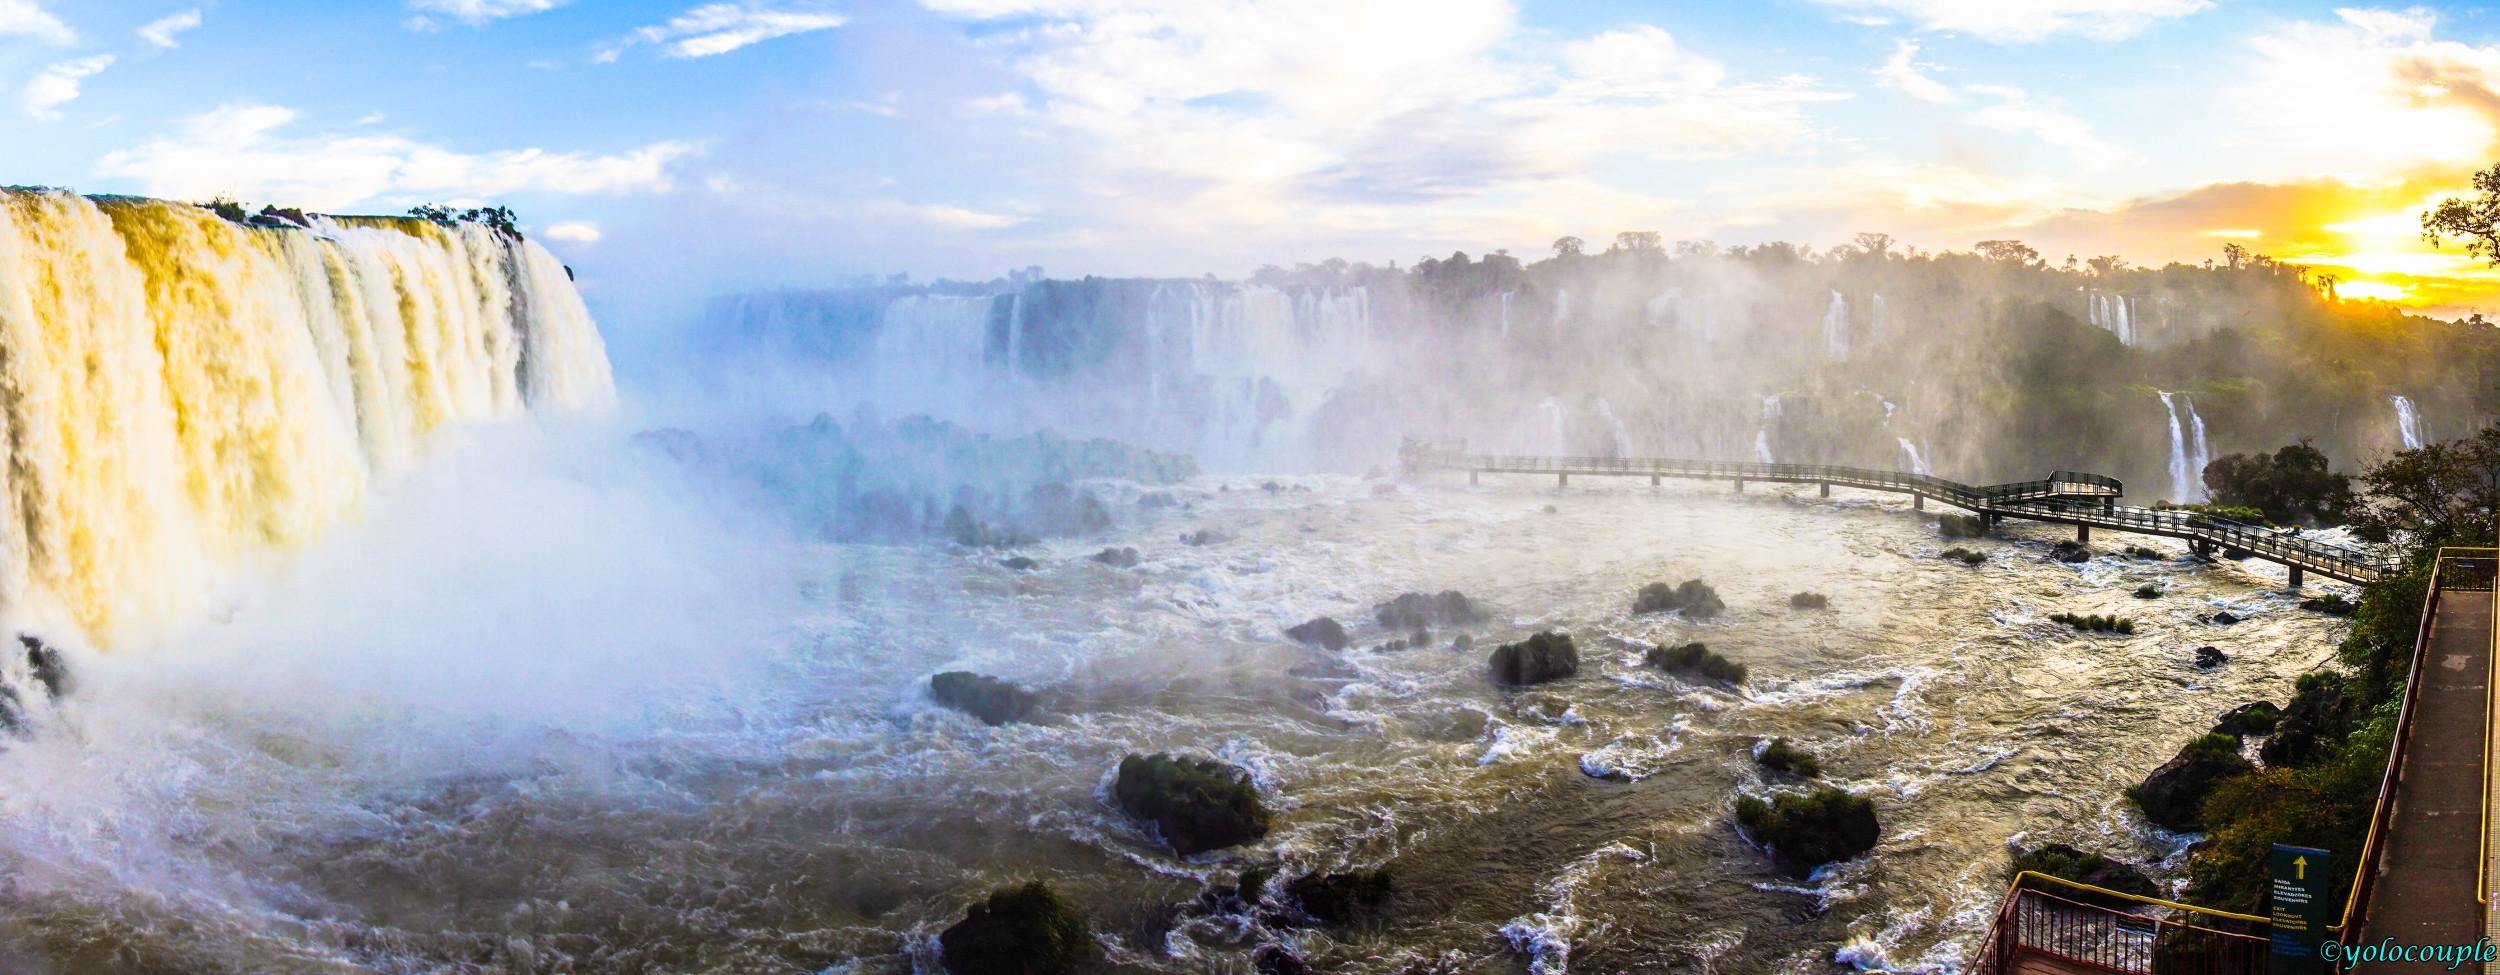 Amazing Iguazu Falls Brazil Yolocouple